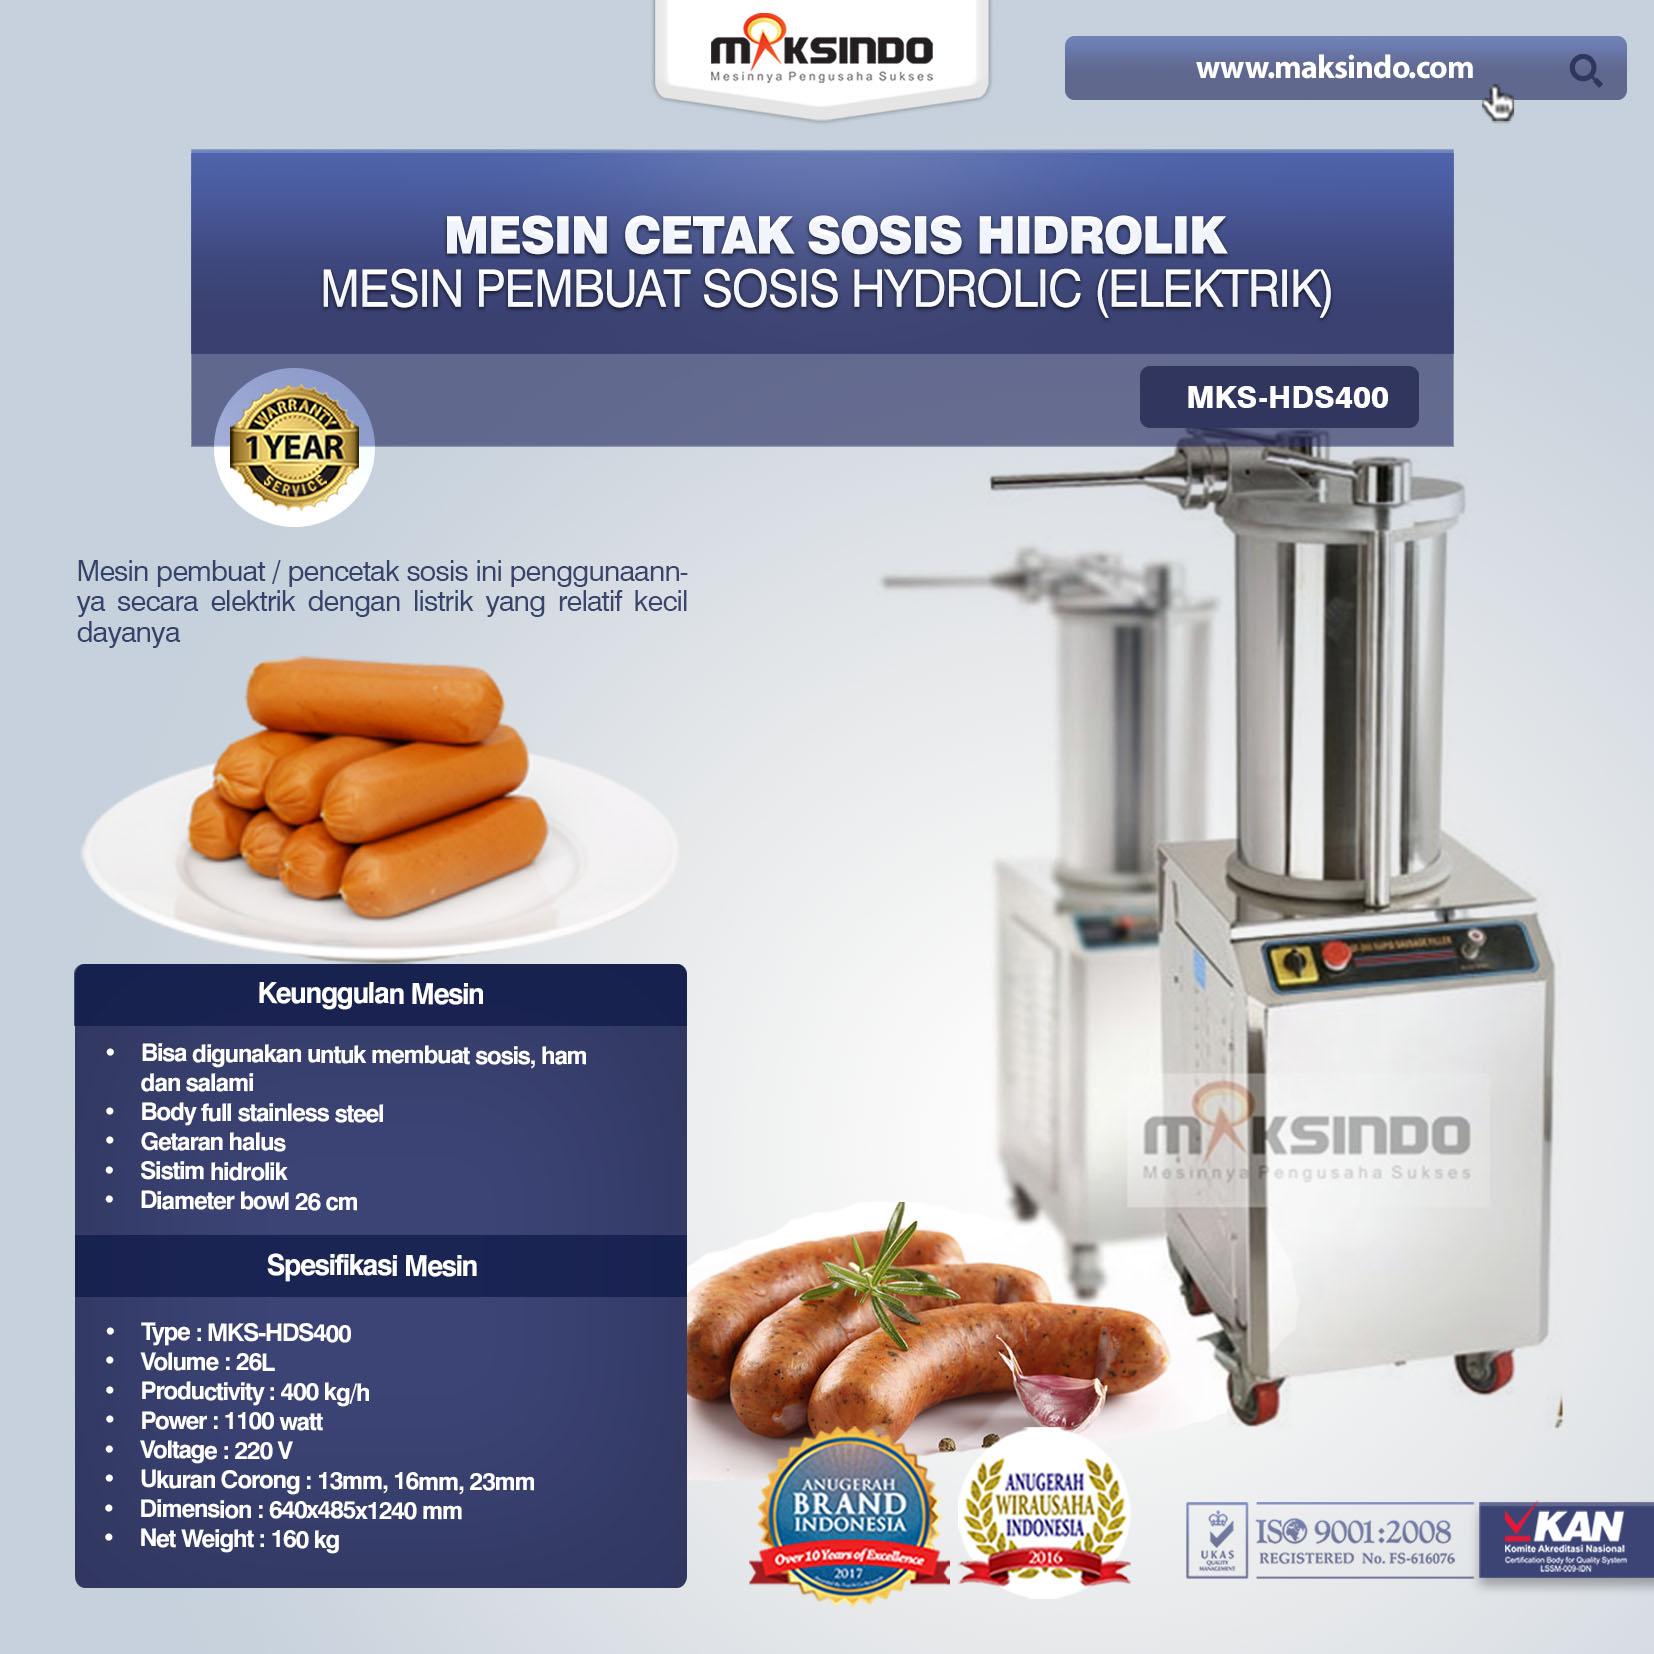 Mesin Cetak Sosis Hidrolik MKS-HDS400 Elektrik